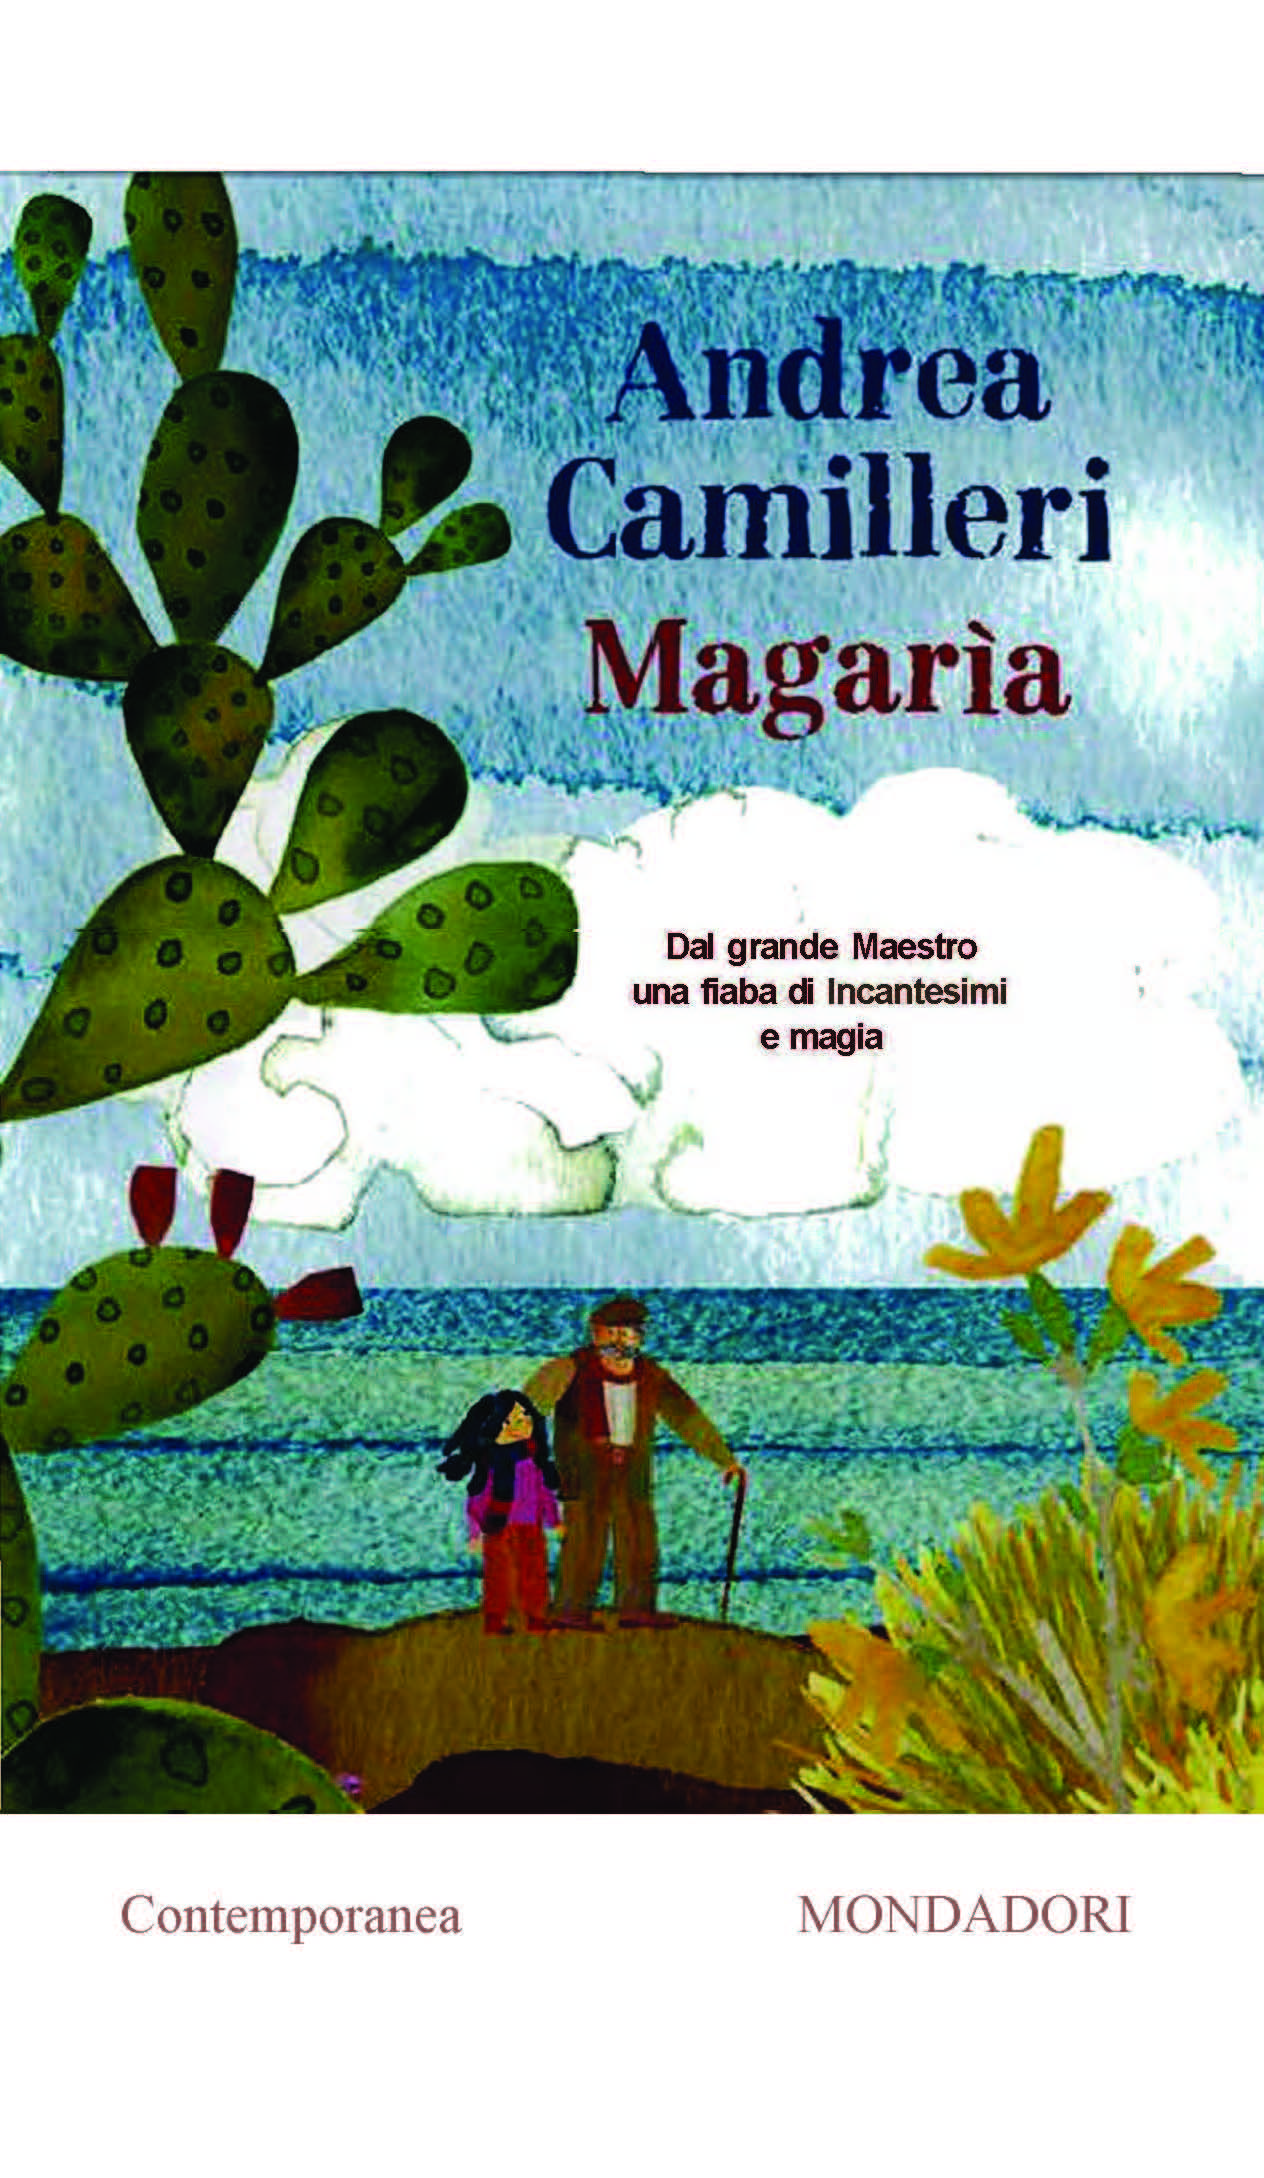 camilleri-magaria-copertina